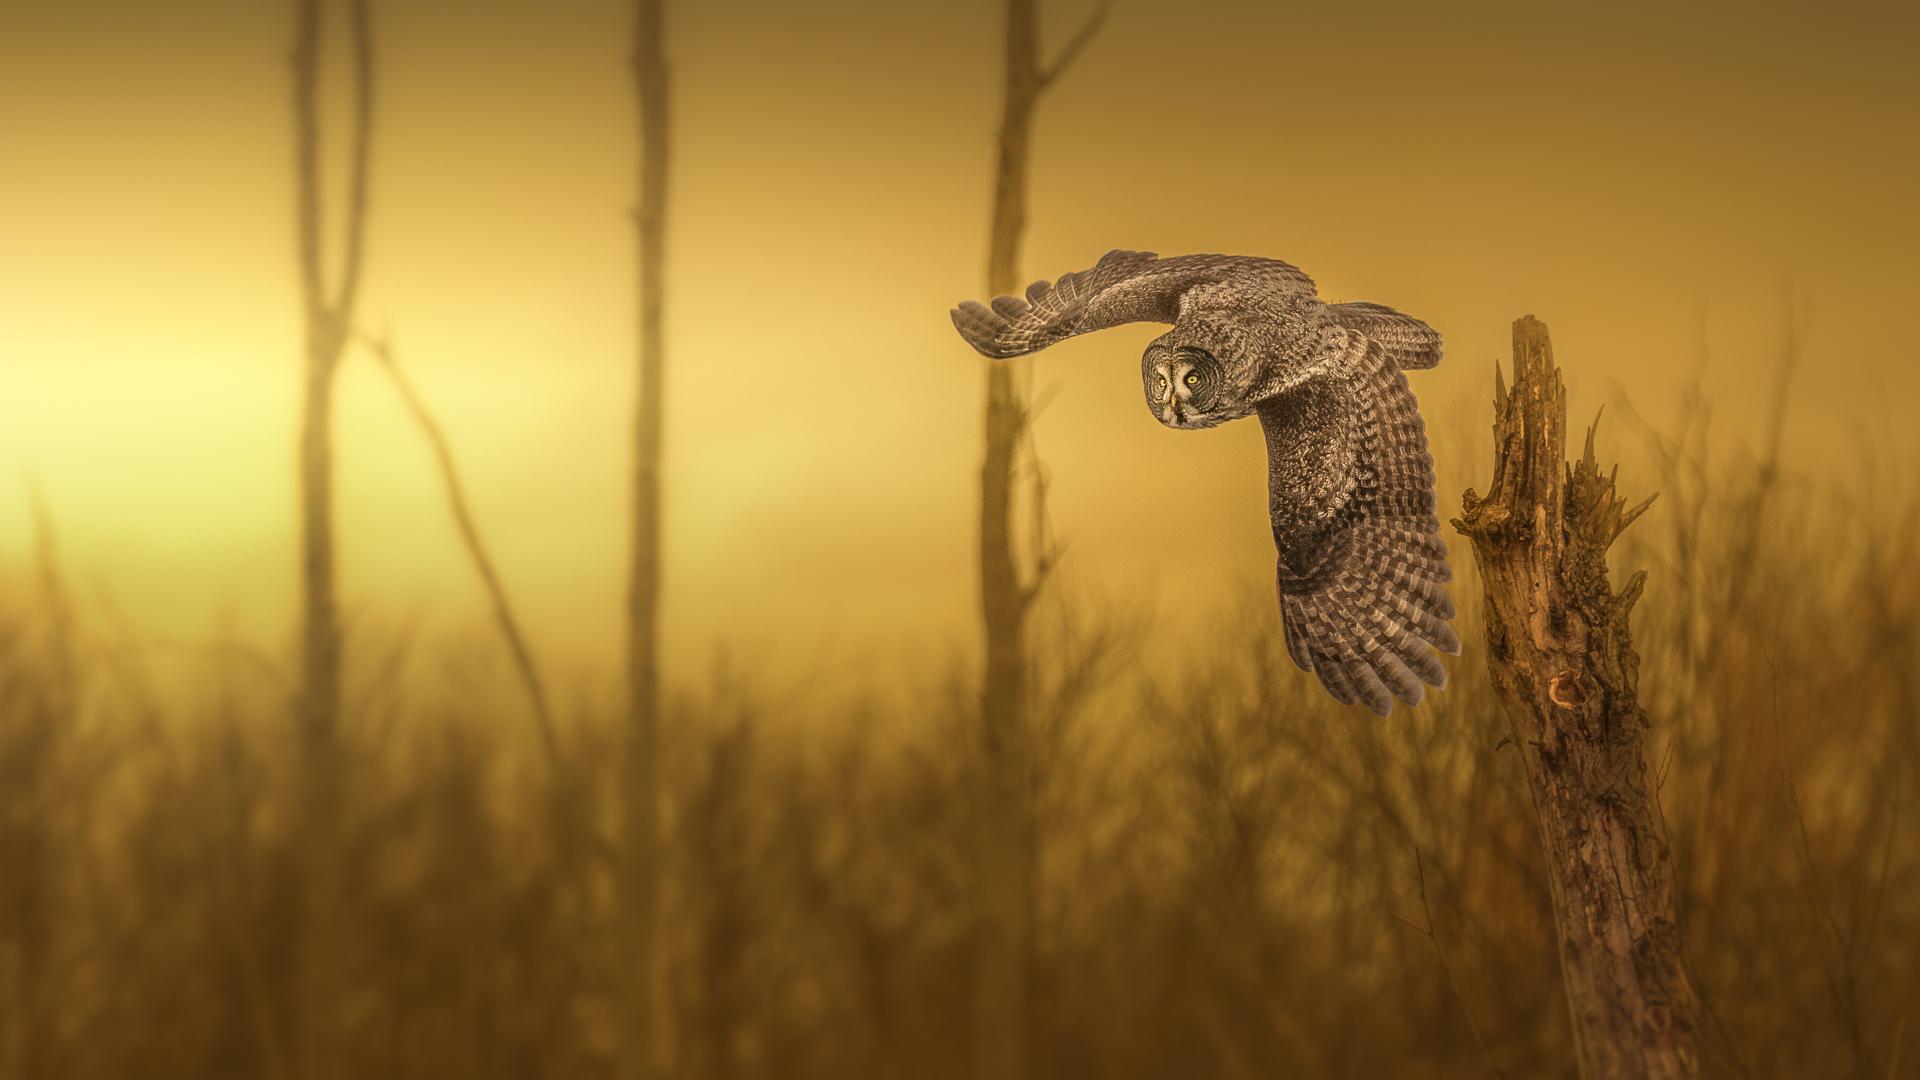 """L'heure de la chasse"" Yves Kéroack Club photo Impression 2e prix thème: Animalier"